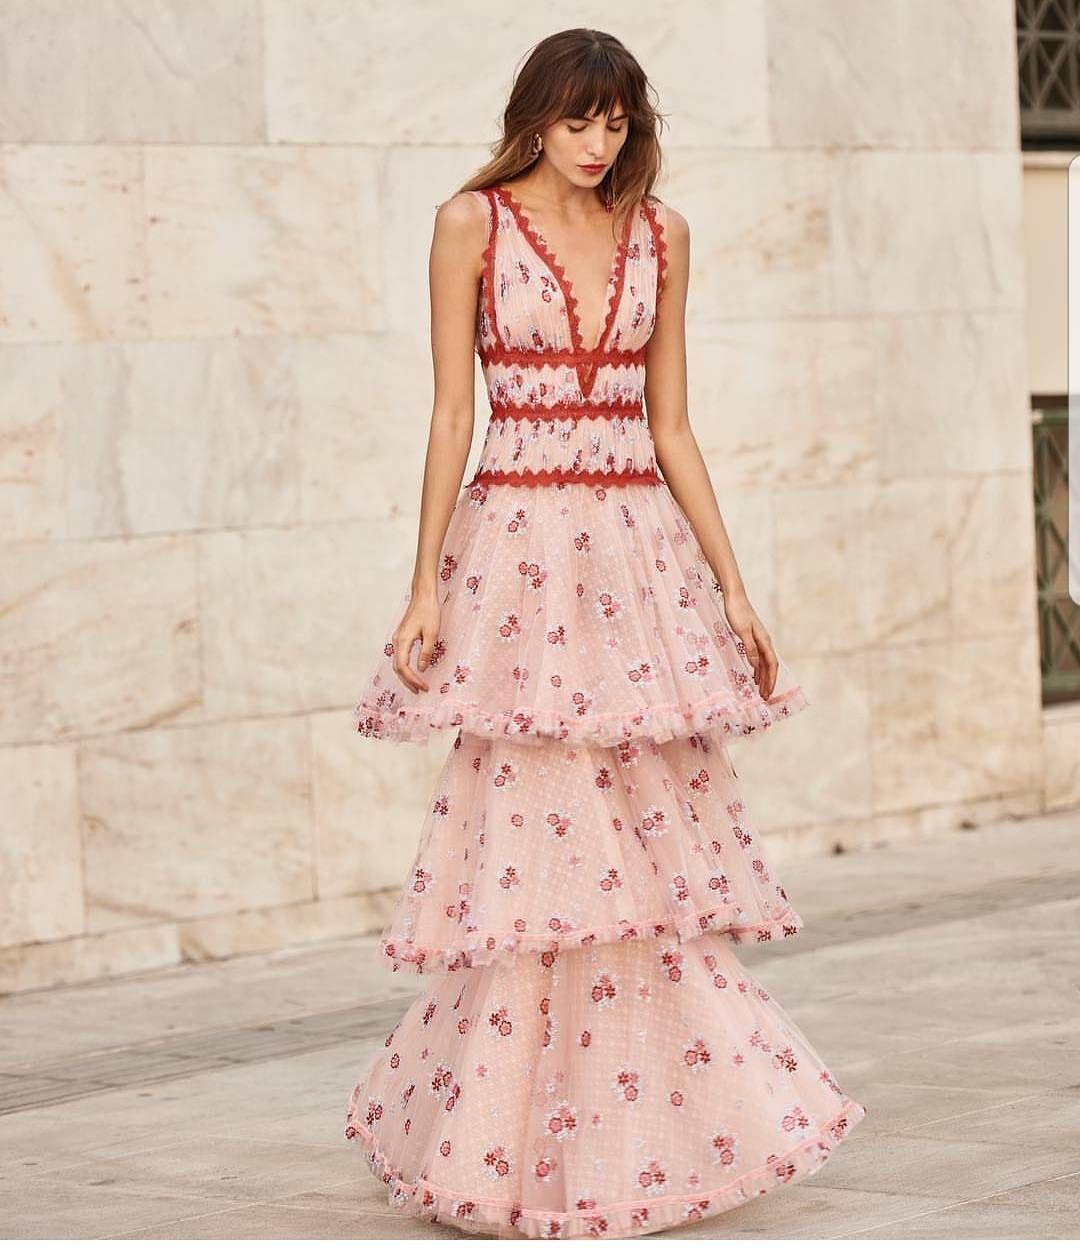 christoscostarellos #dresses #dress #red #girl #fashion   boho style ...